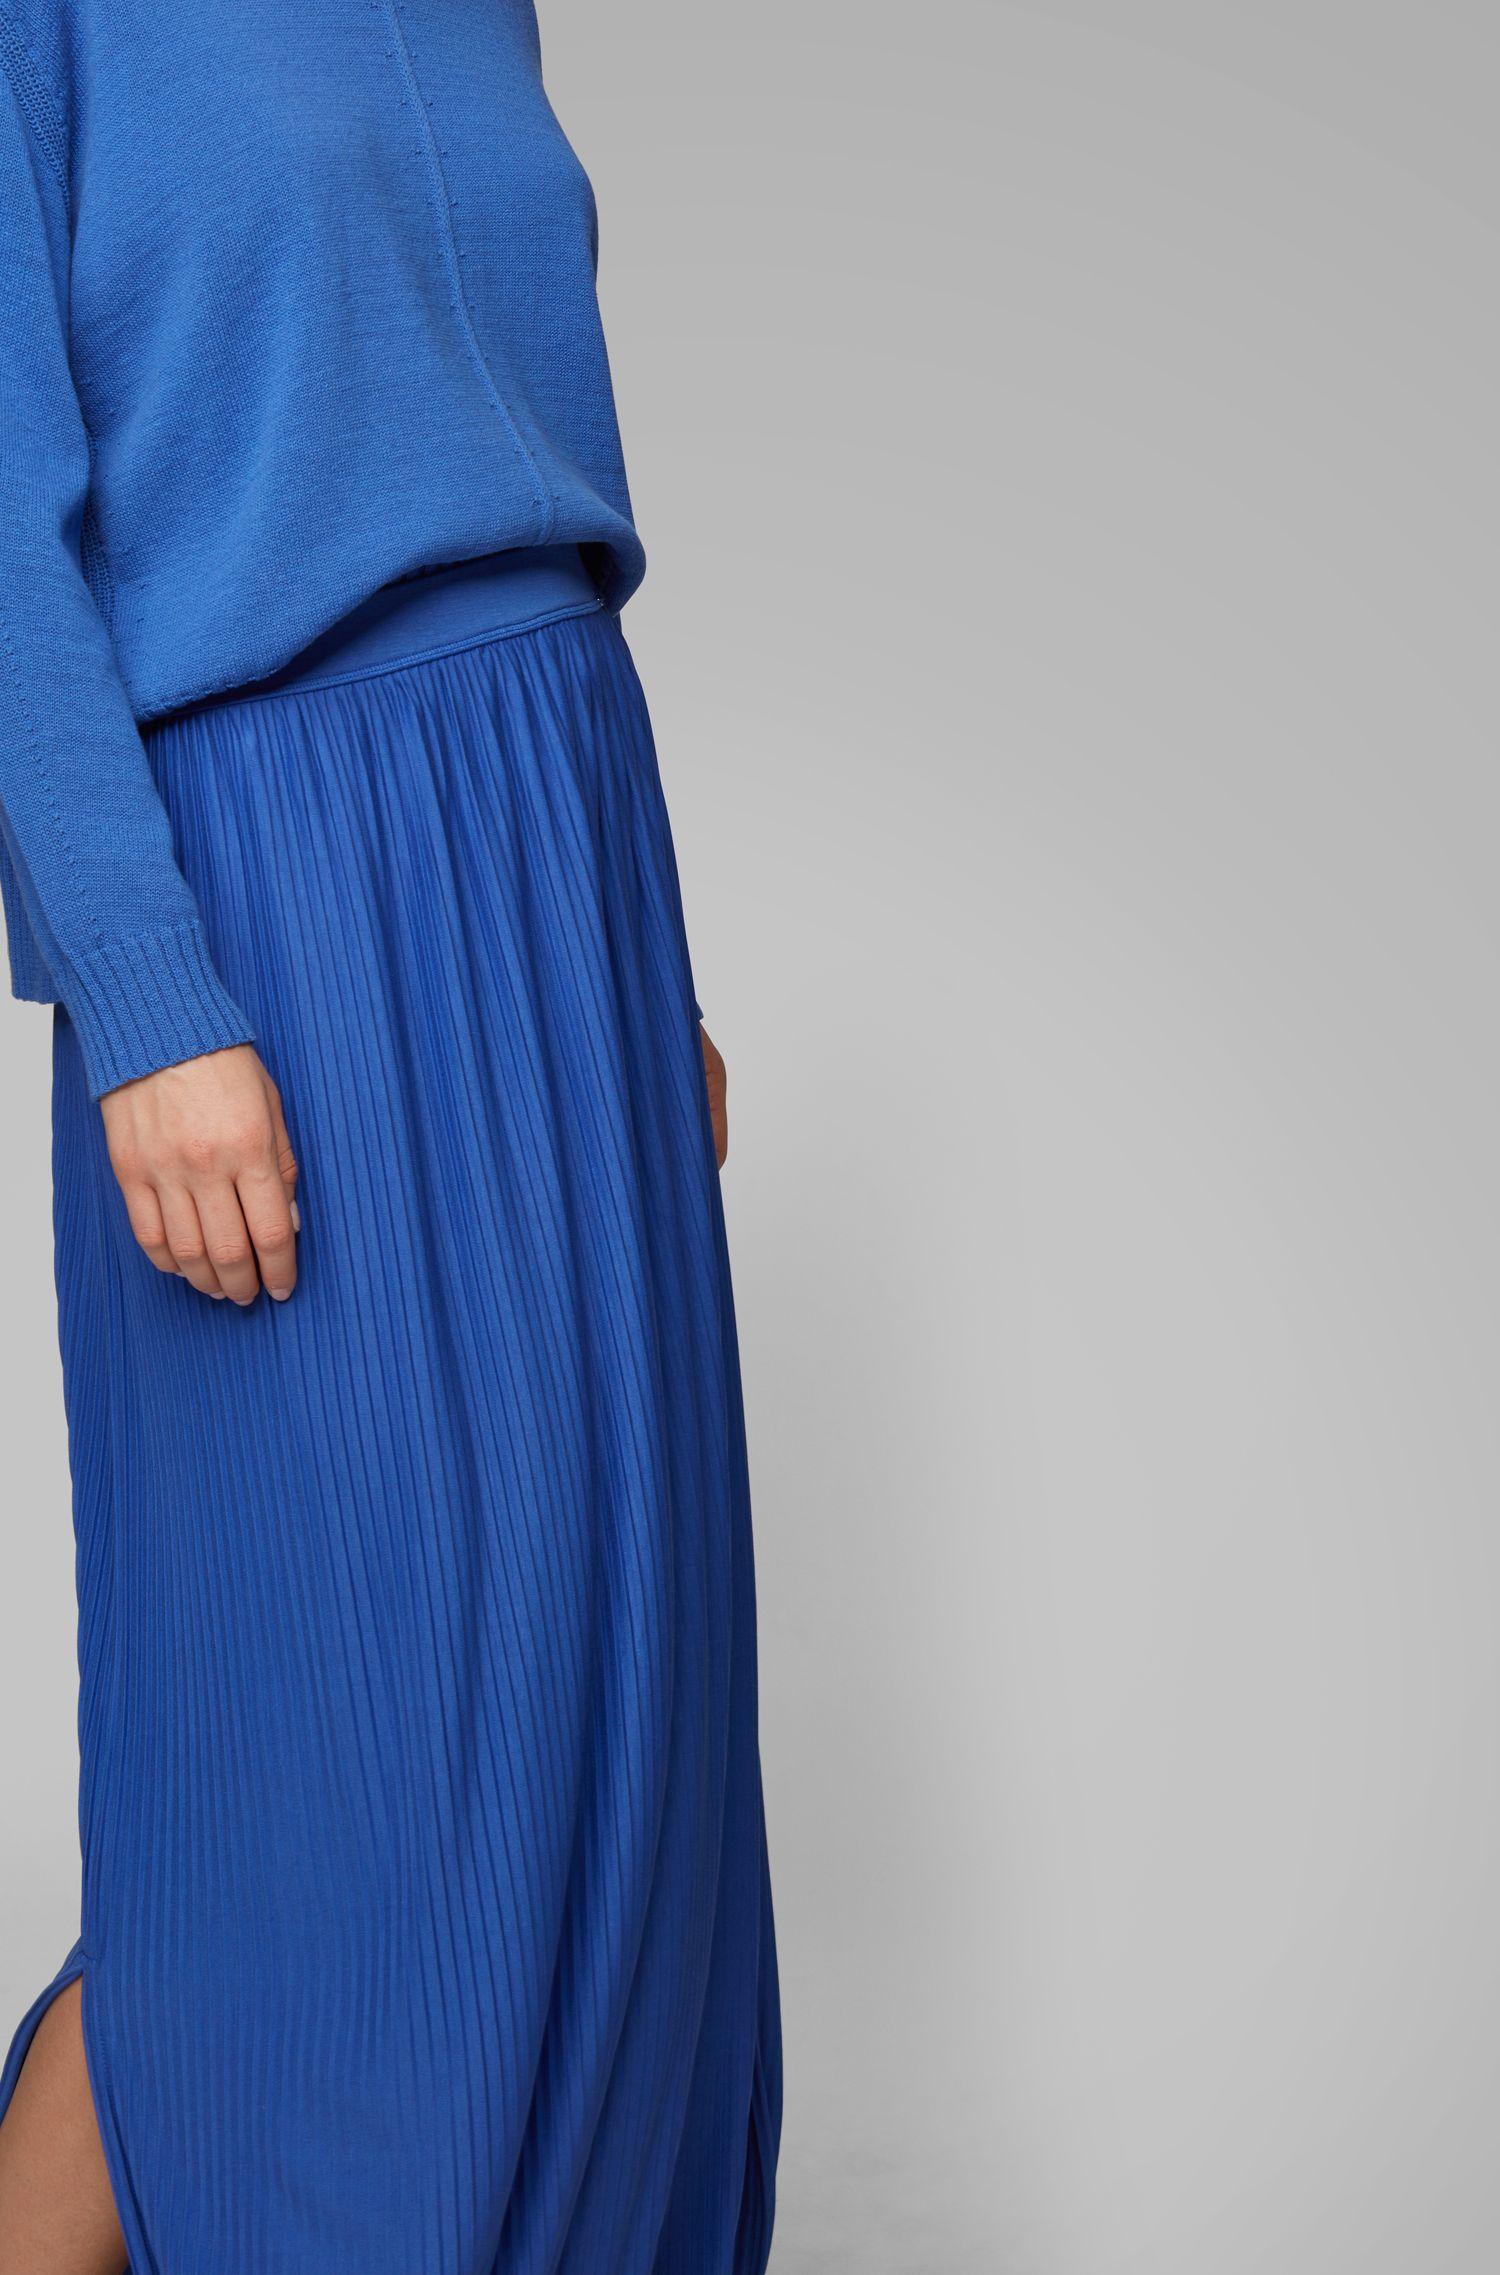 Jersey-Maxirock mit feinen Plissee-Falten, Blau